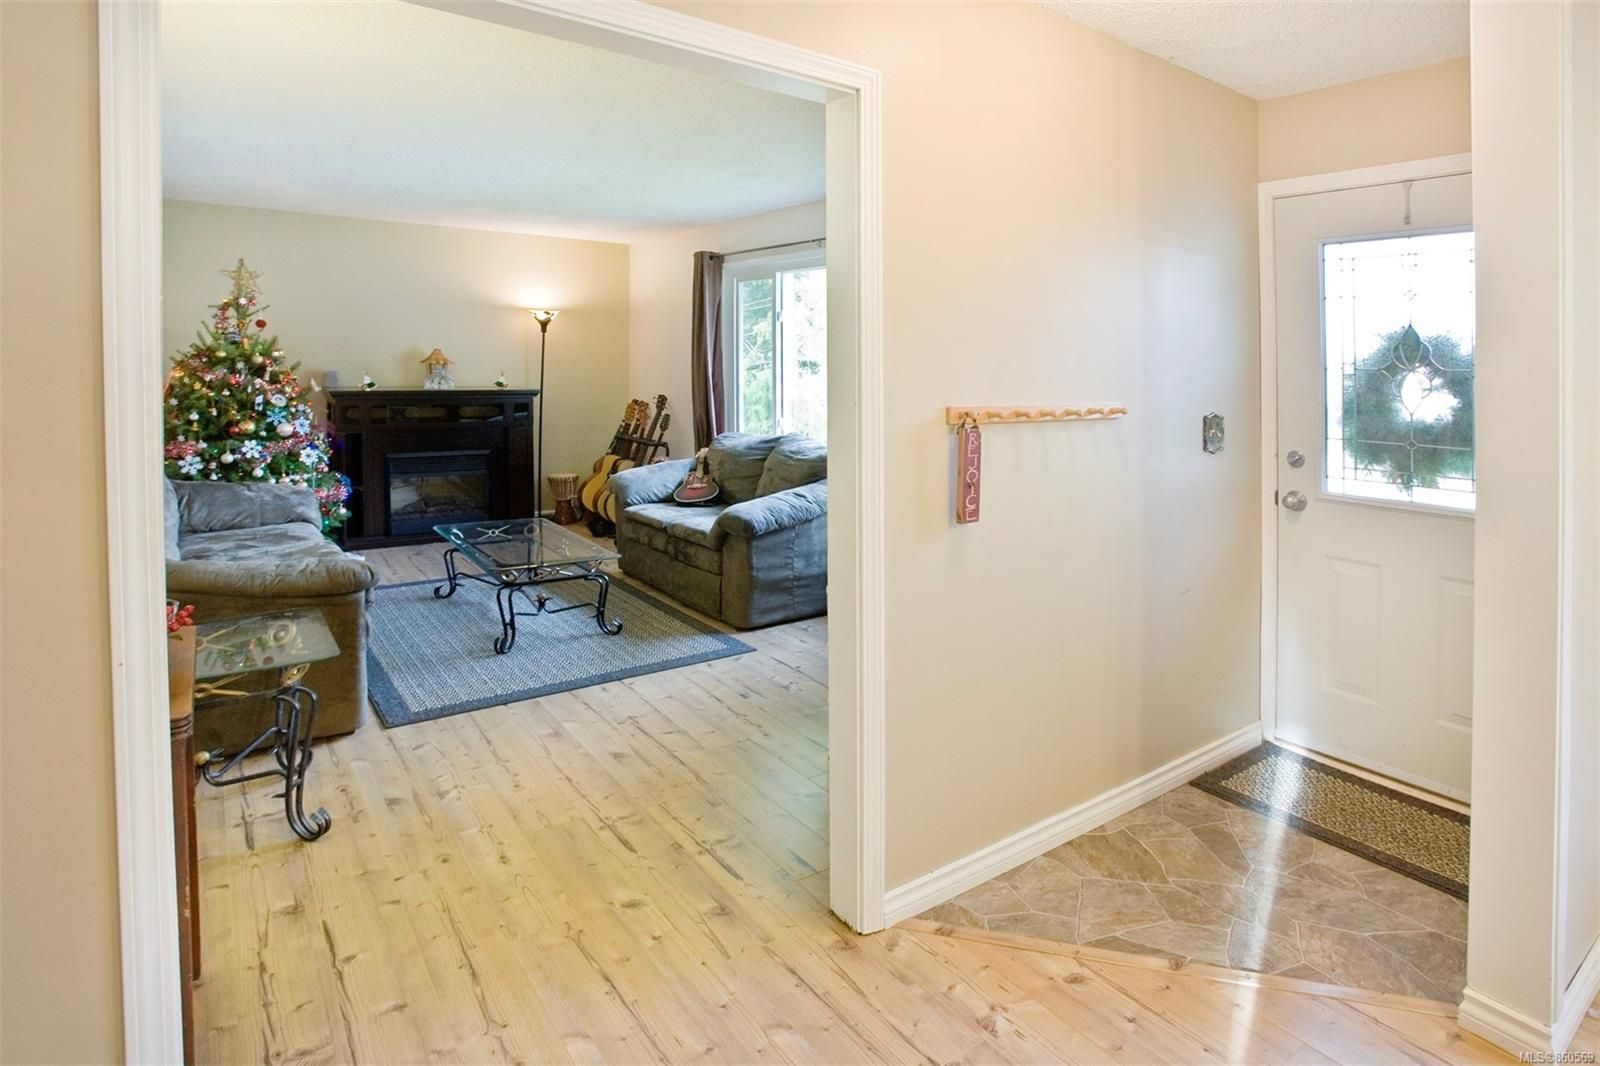 Photo 7: Photos: 4156 Ravenhill Ave in : PA Port Alberni House for sale (Port Alberni)  : MLS®# 860569